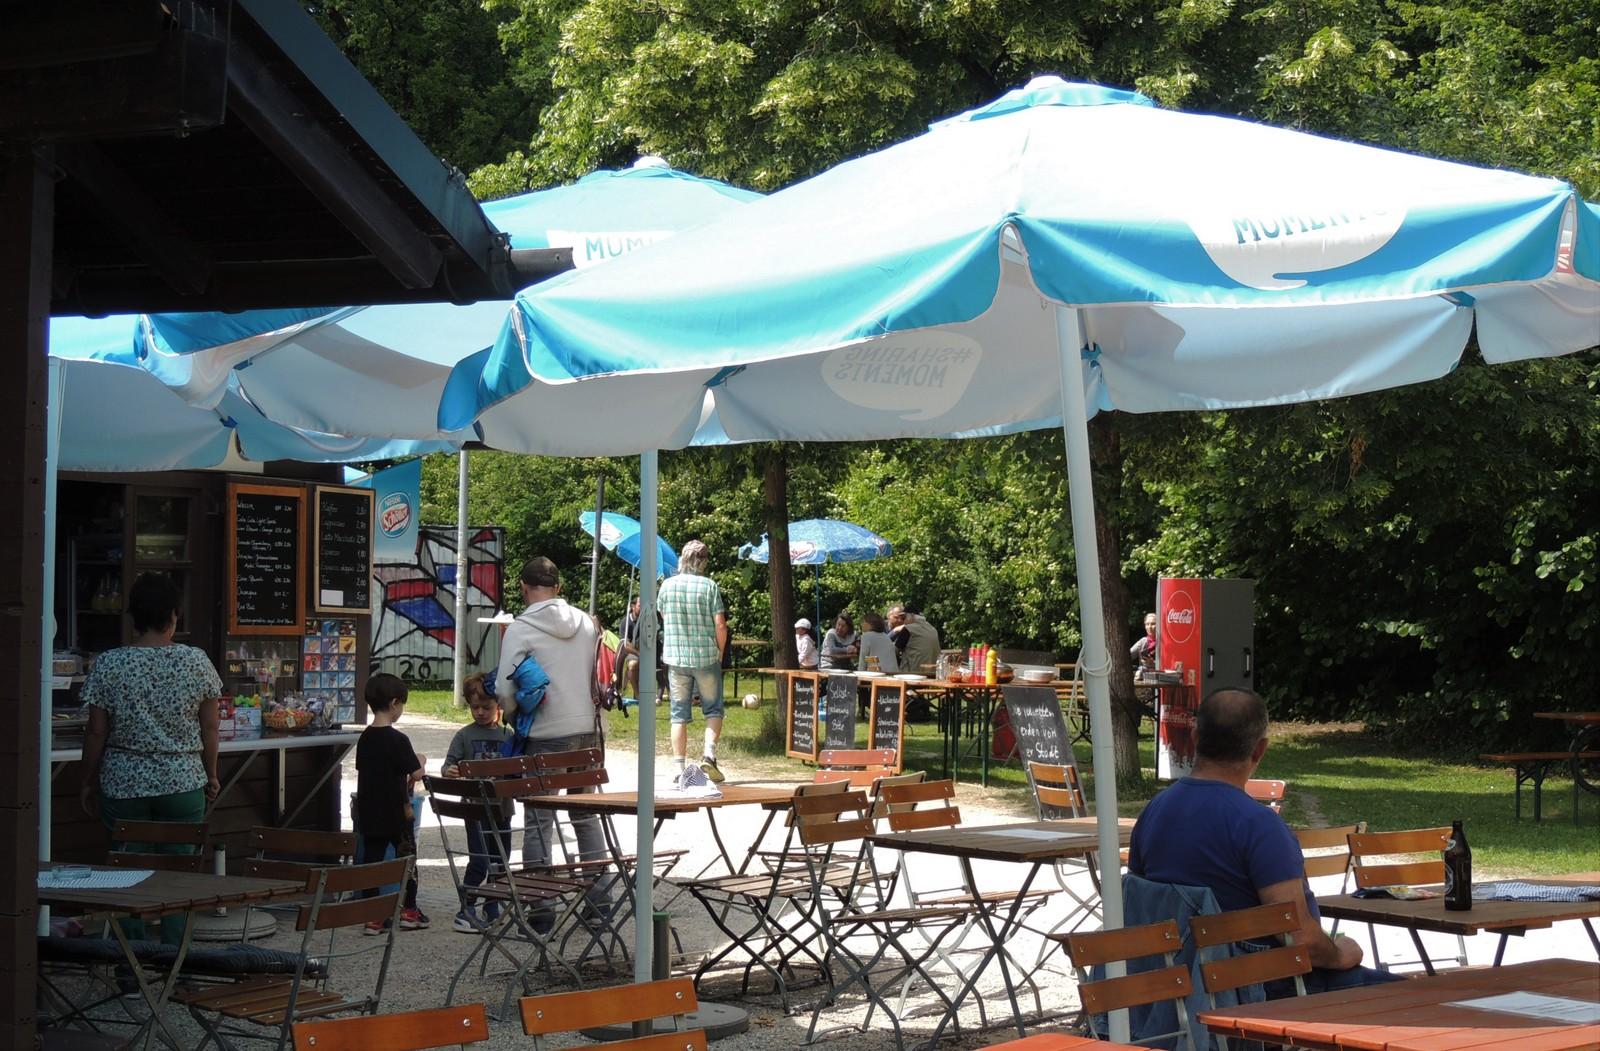 Kiosk am Wolkenturm - Westpark München